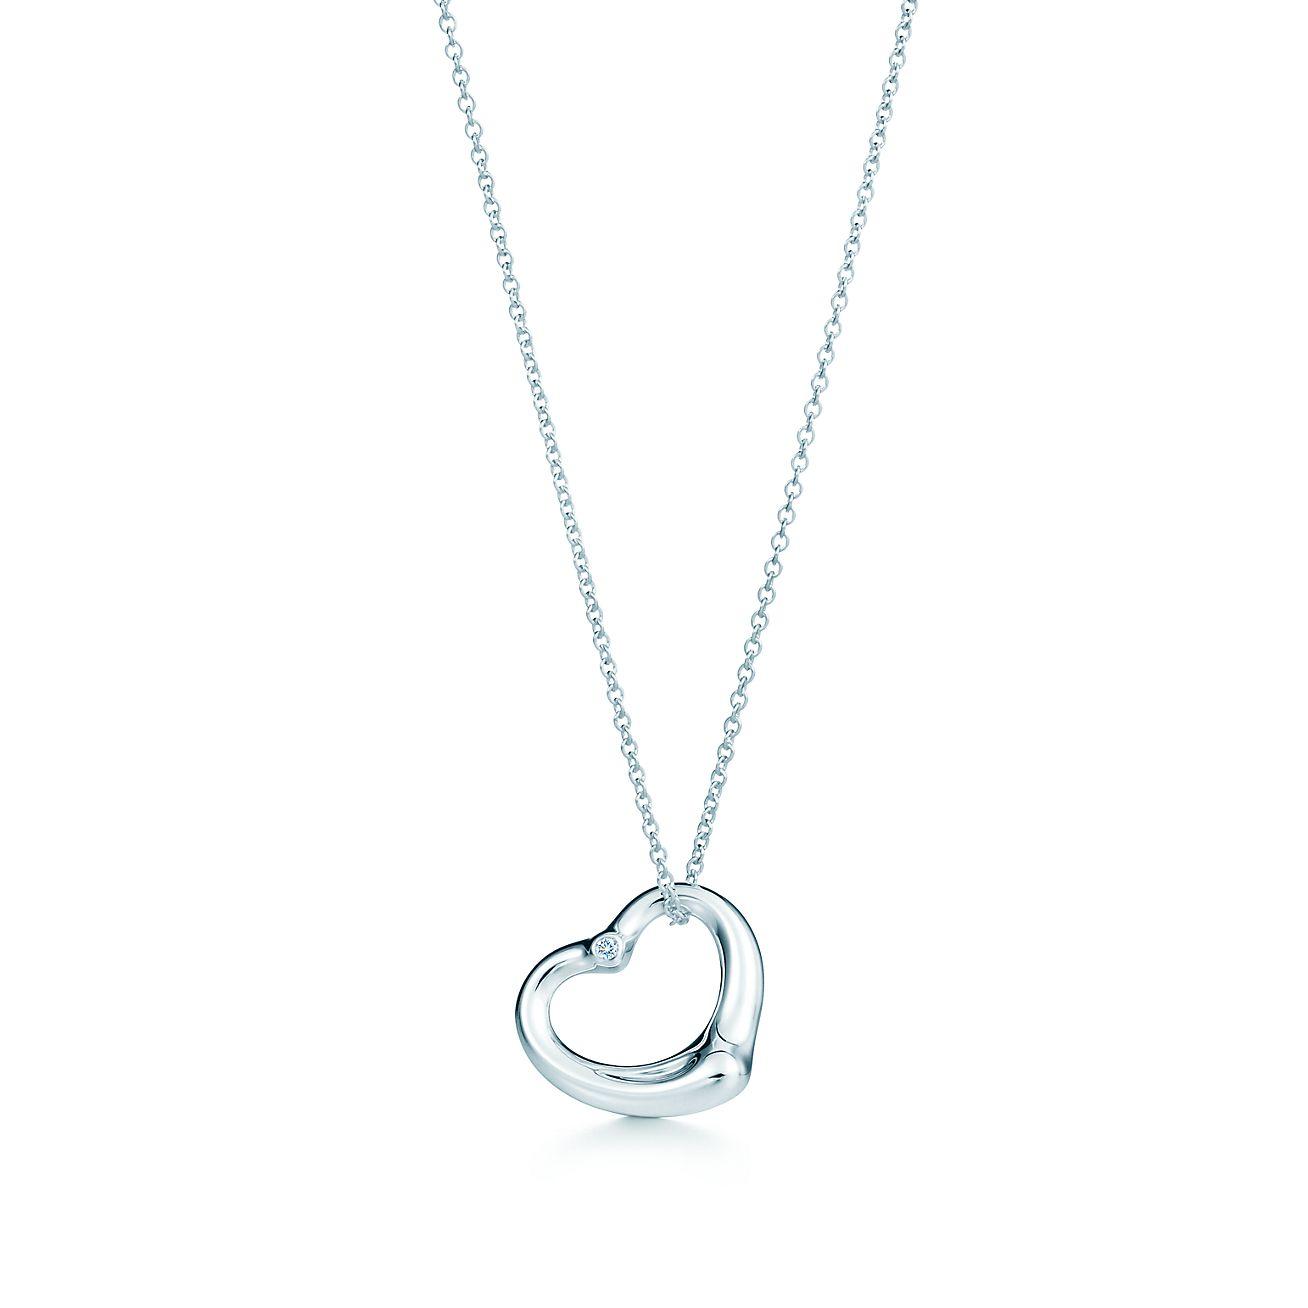 Elsa Peretti Open Heart pendant in sterling silver - Size 27 mm Tiffany & Co. r9WV8eu6